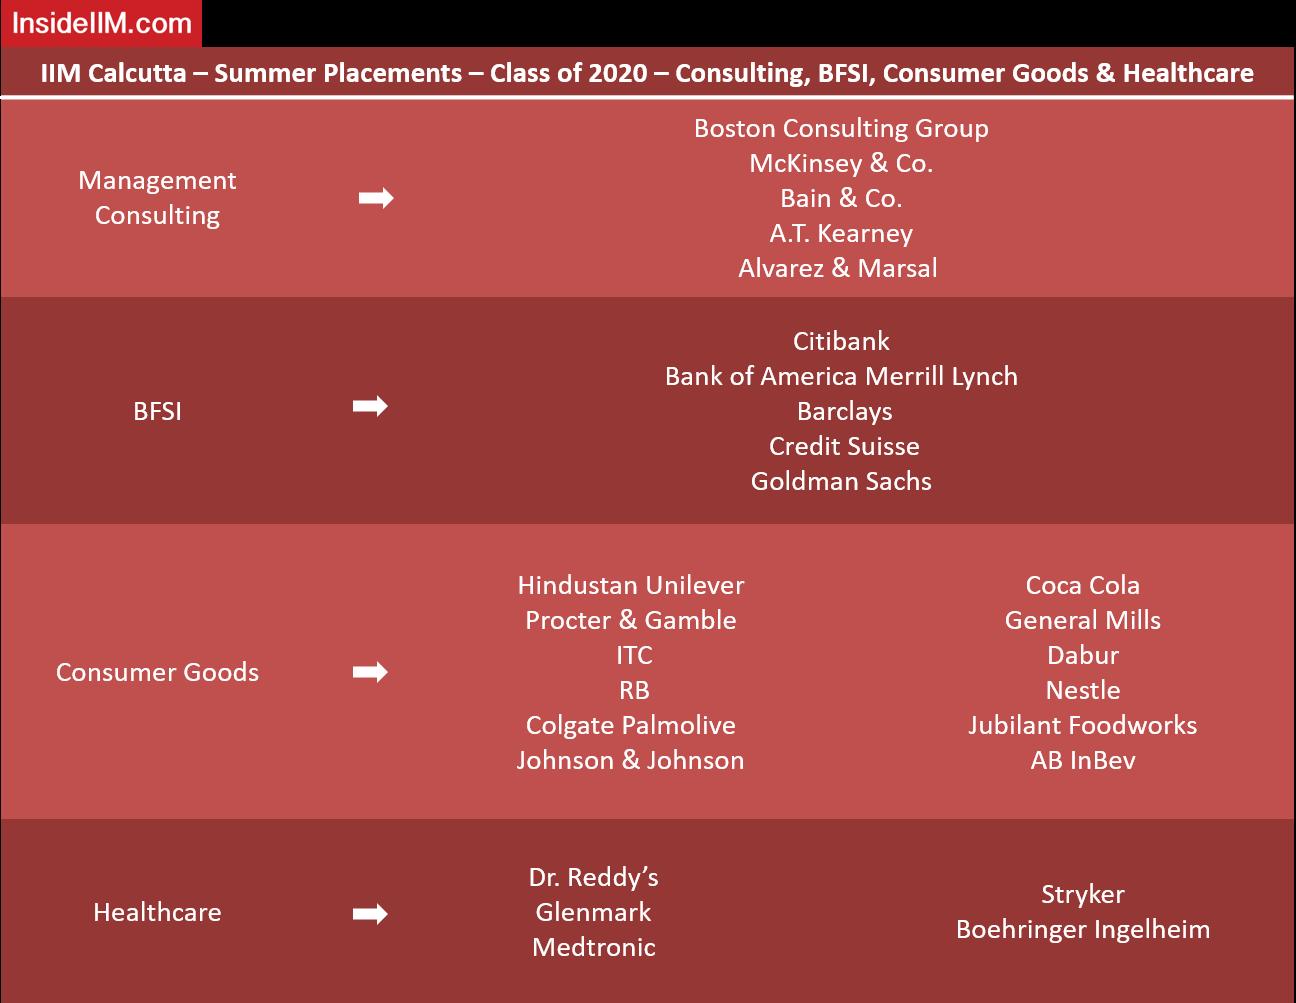 IIM Calcutta Summer Placements - Companies: Consulting, BFSI, Consumer Goods & Healthcare